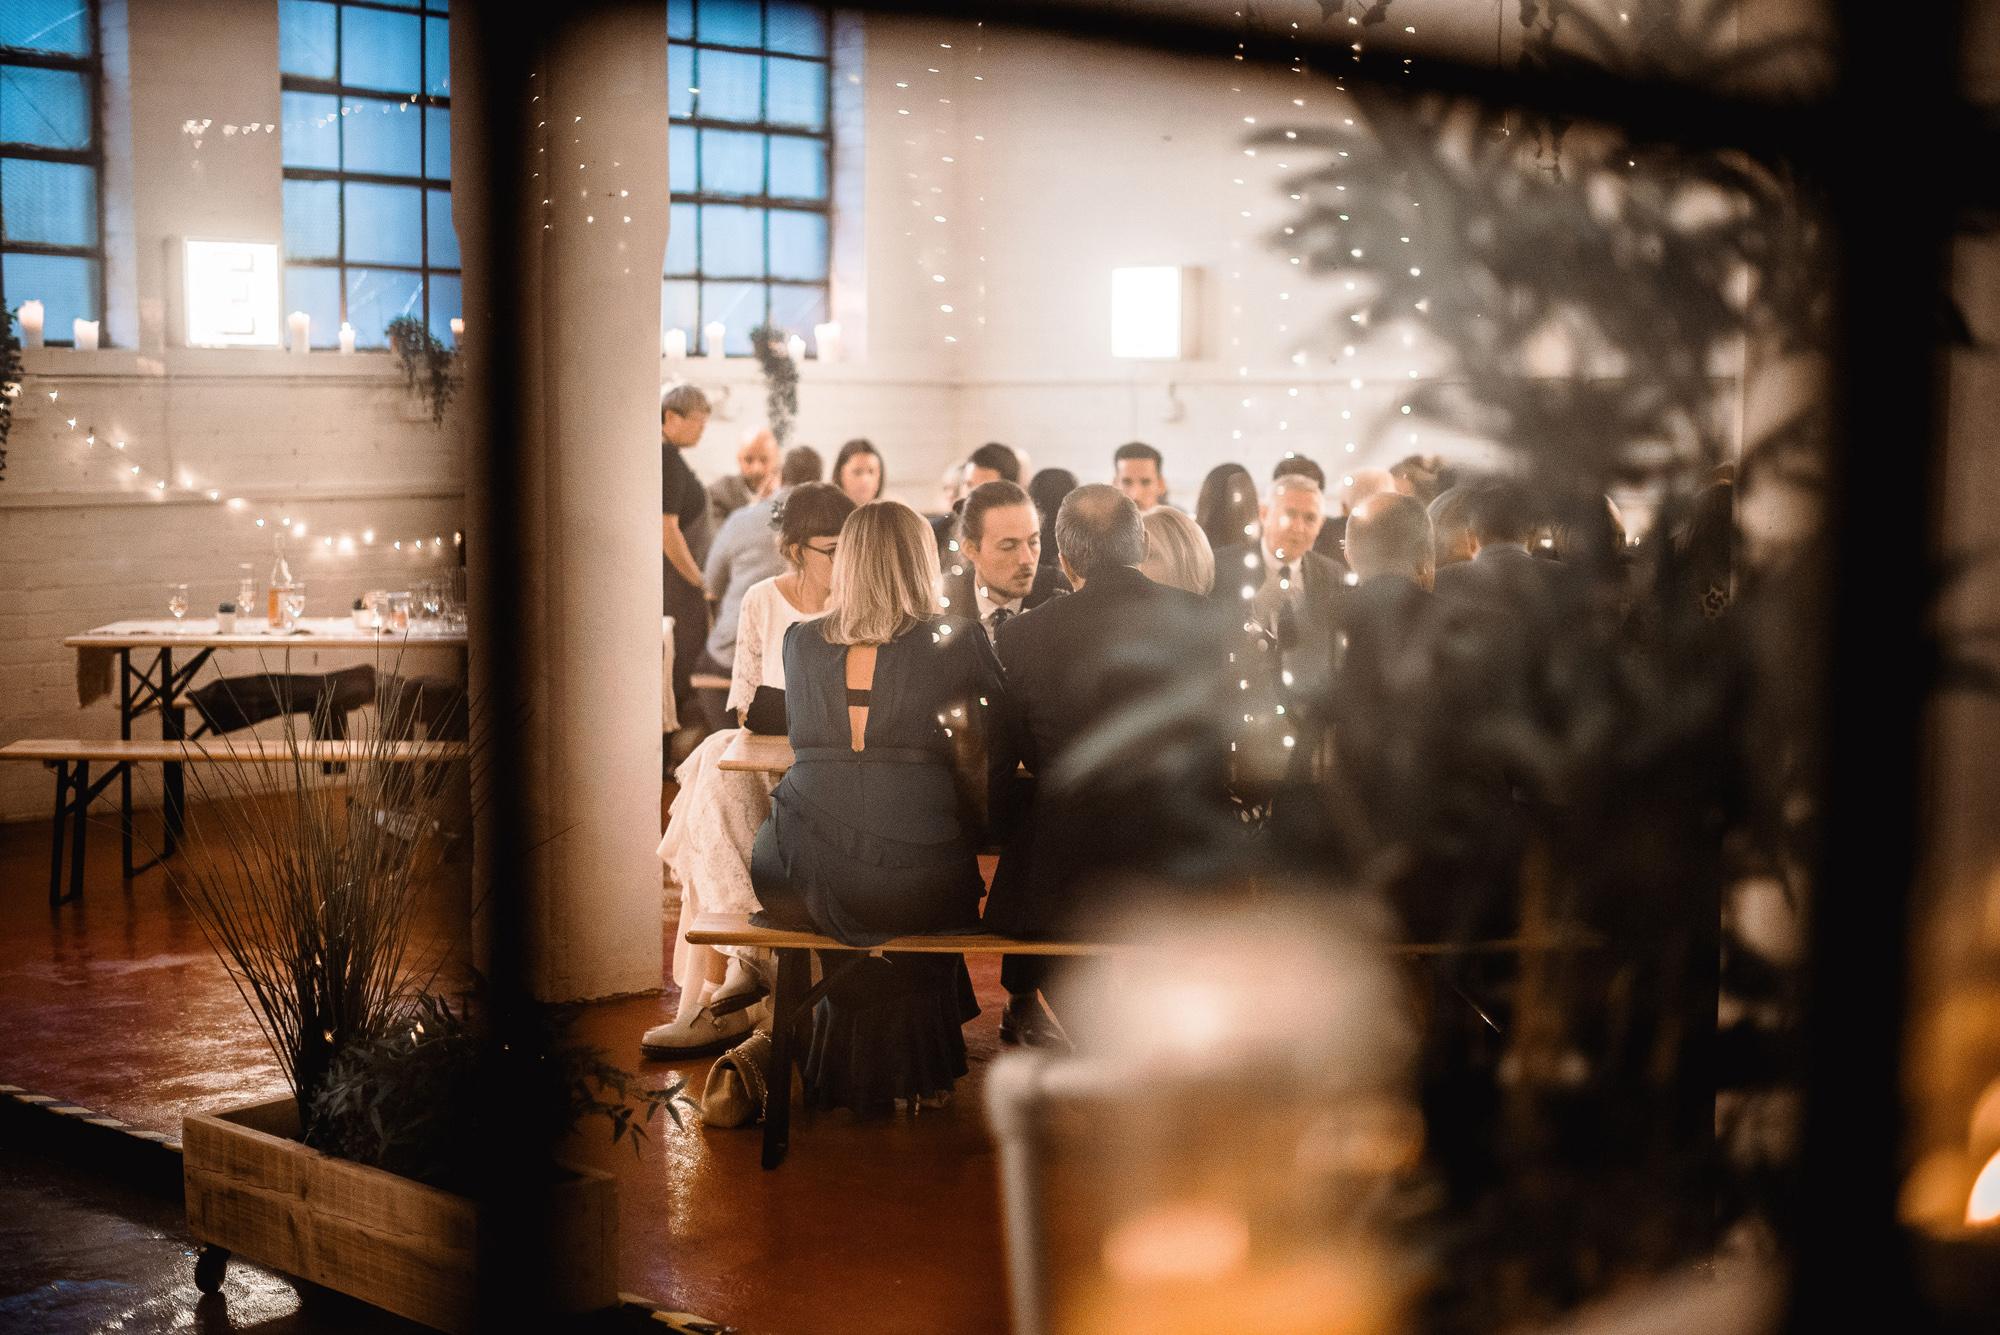 Harriet-Dahlia-Bespoke-Lace-Silk-Bohemian-Wedding-Dress-Sleeves-Tattooed-Bride-Alternative-Wedding-Sheffield-31.jpg